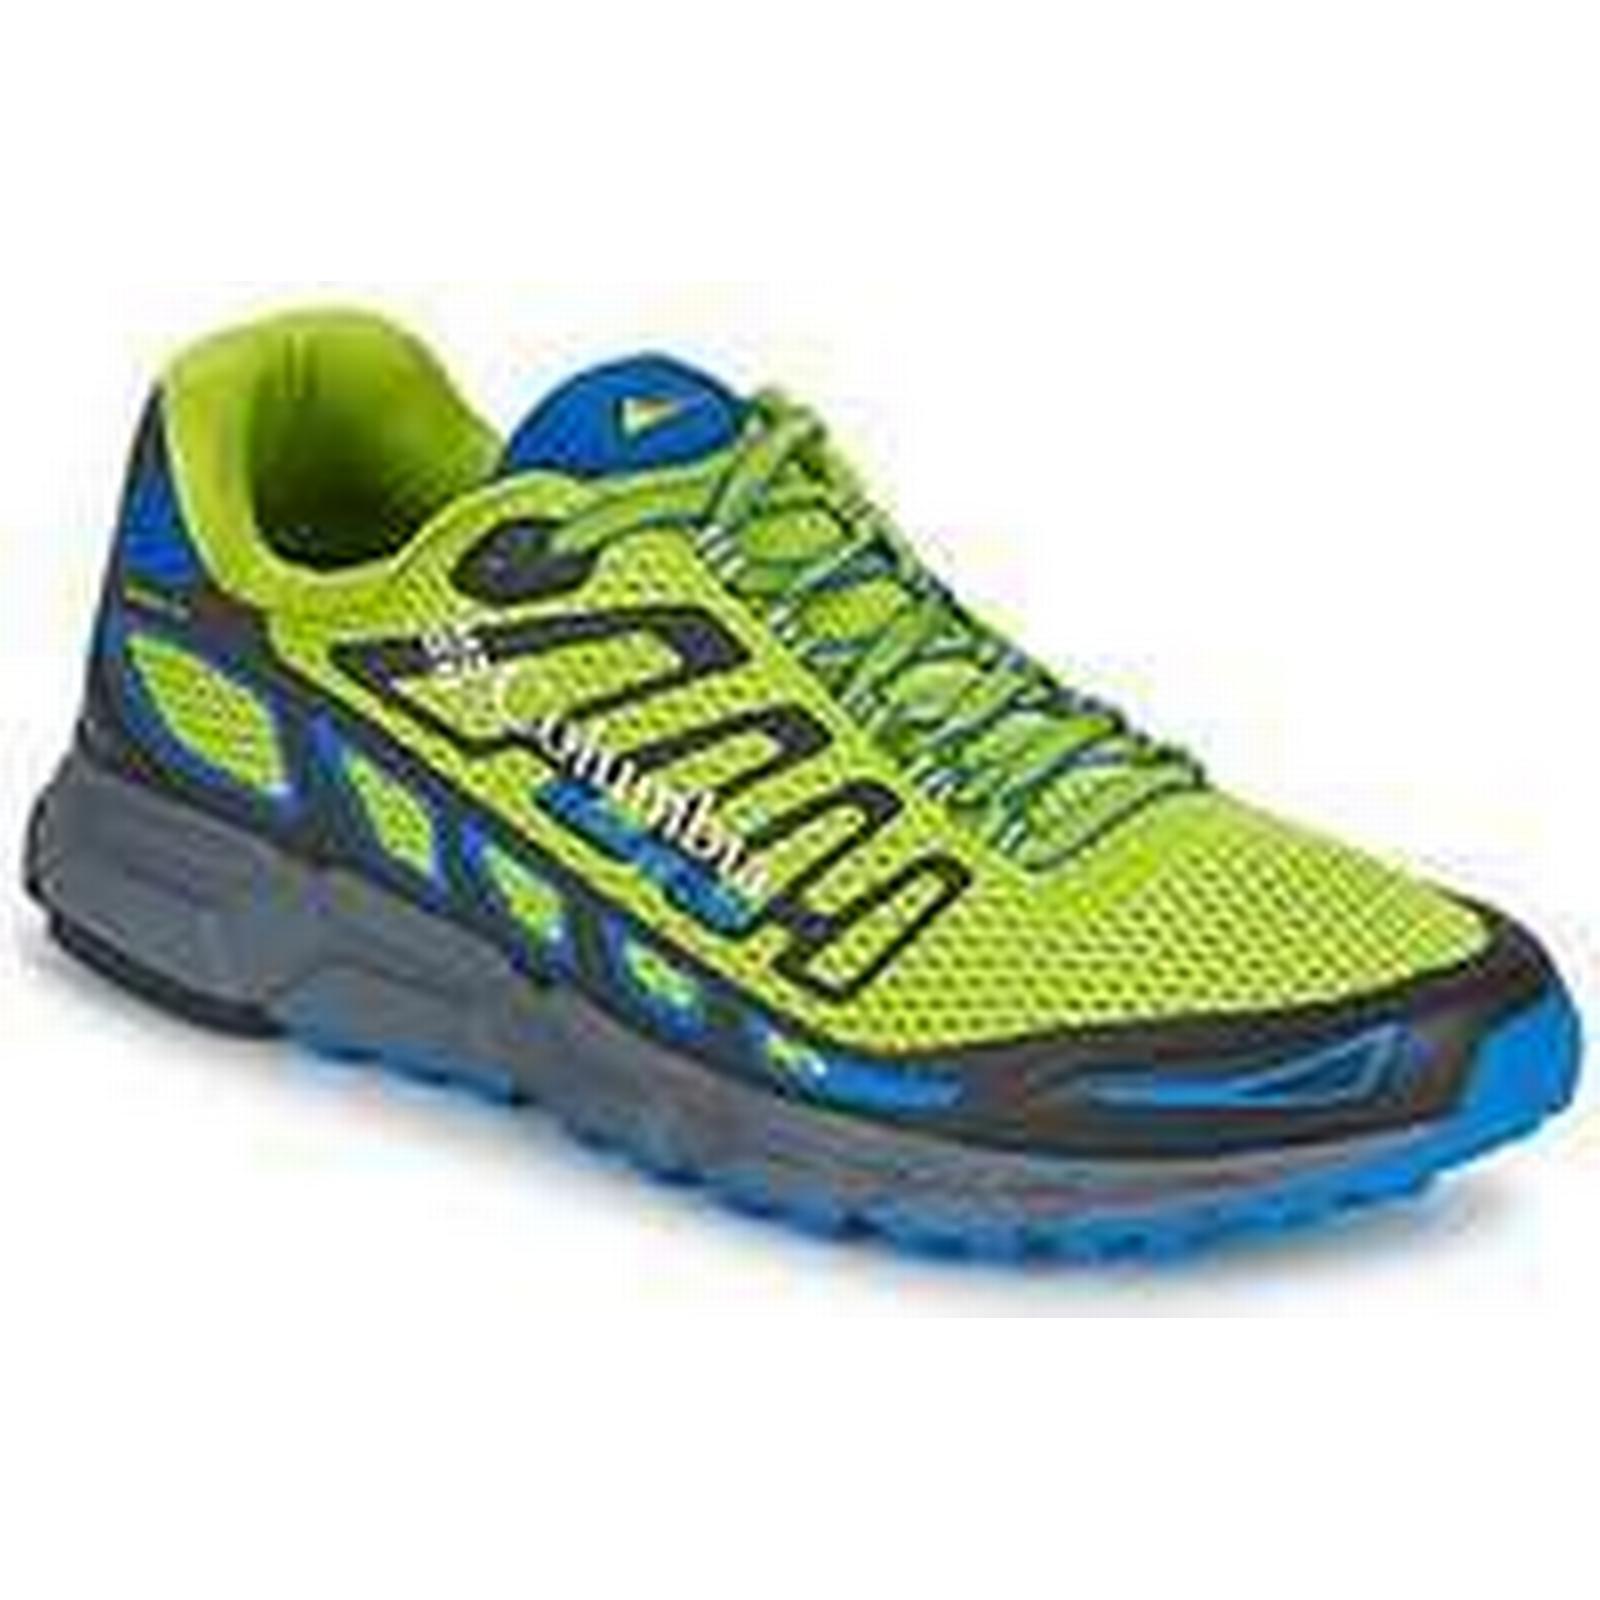 Spartoo.co.uk Columbia Trainers BAJADA™ III men's Running Trainers Columbia in Green 492174